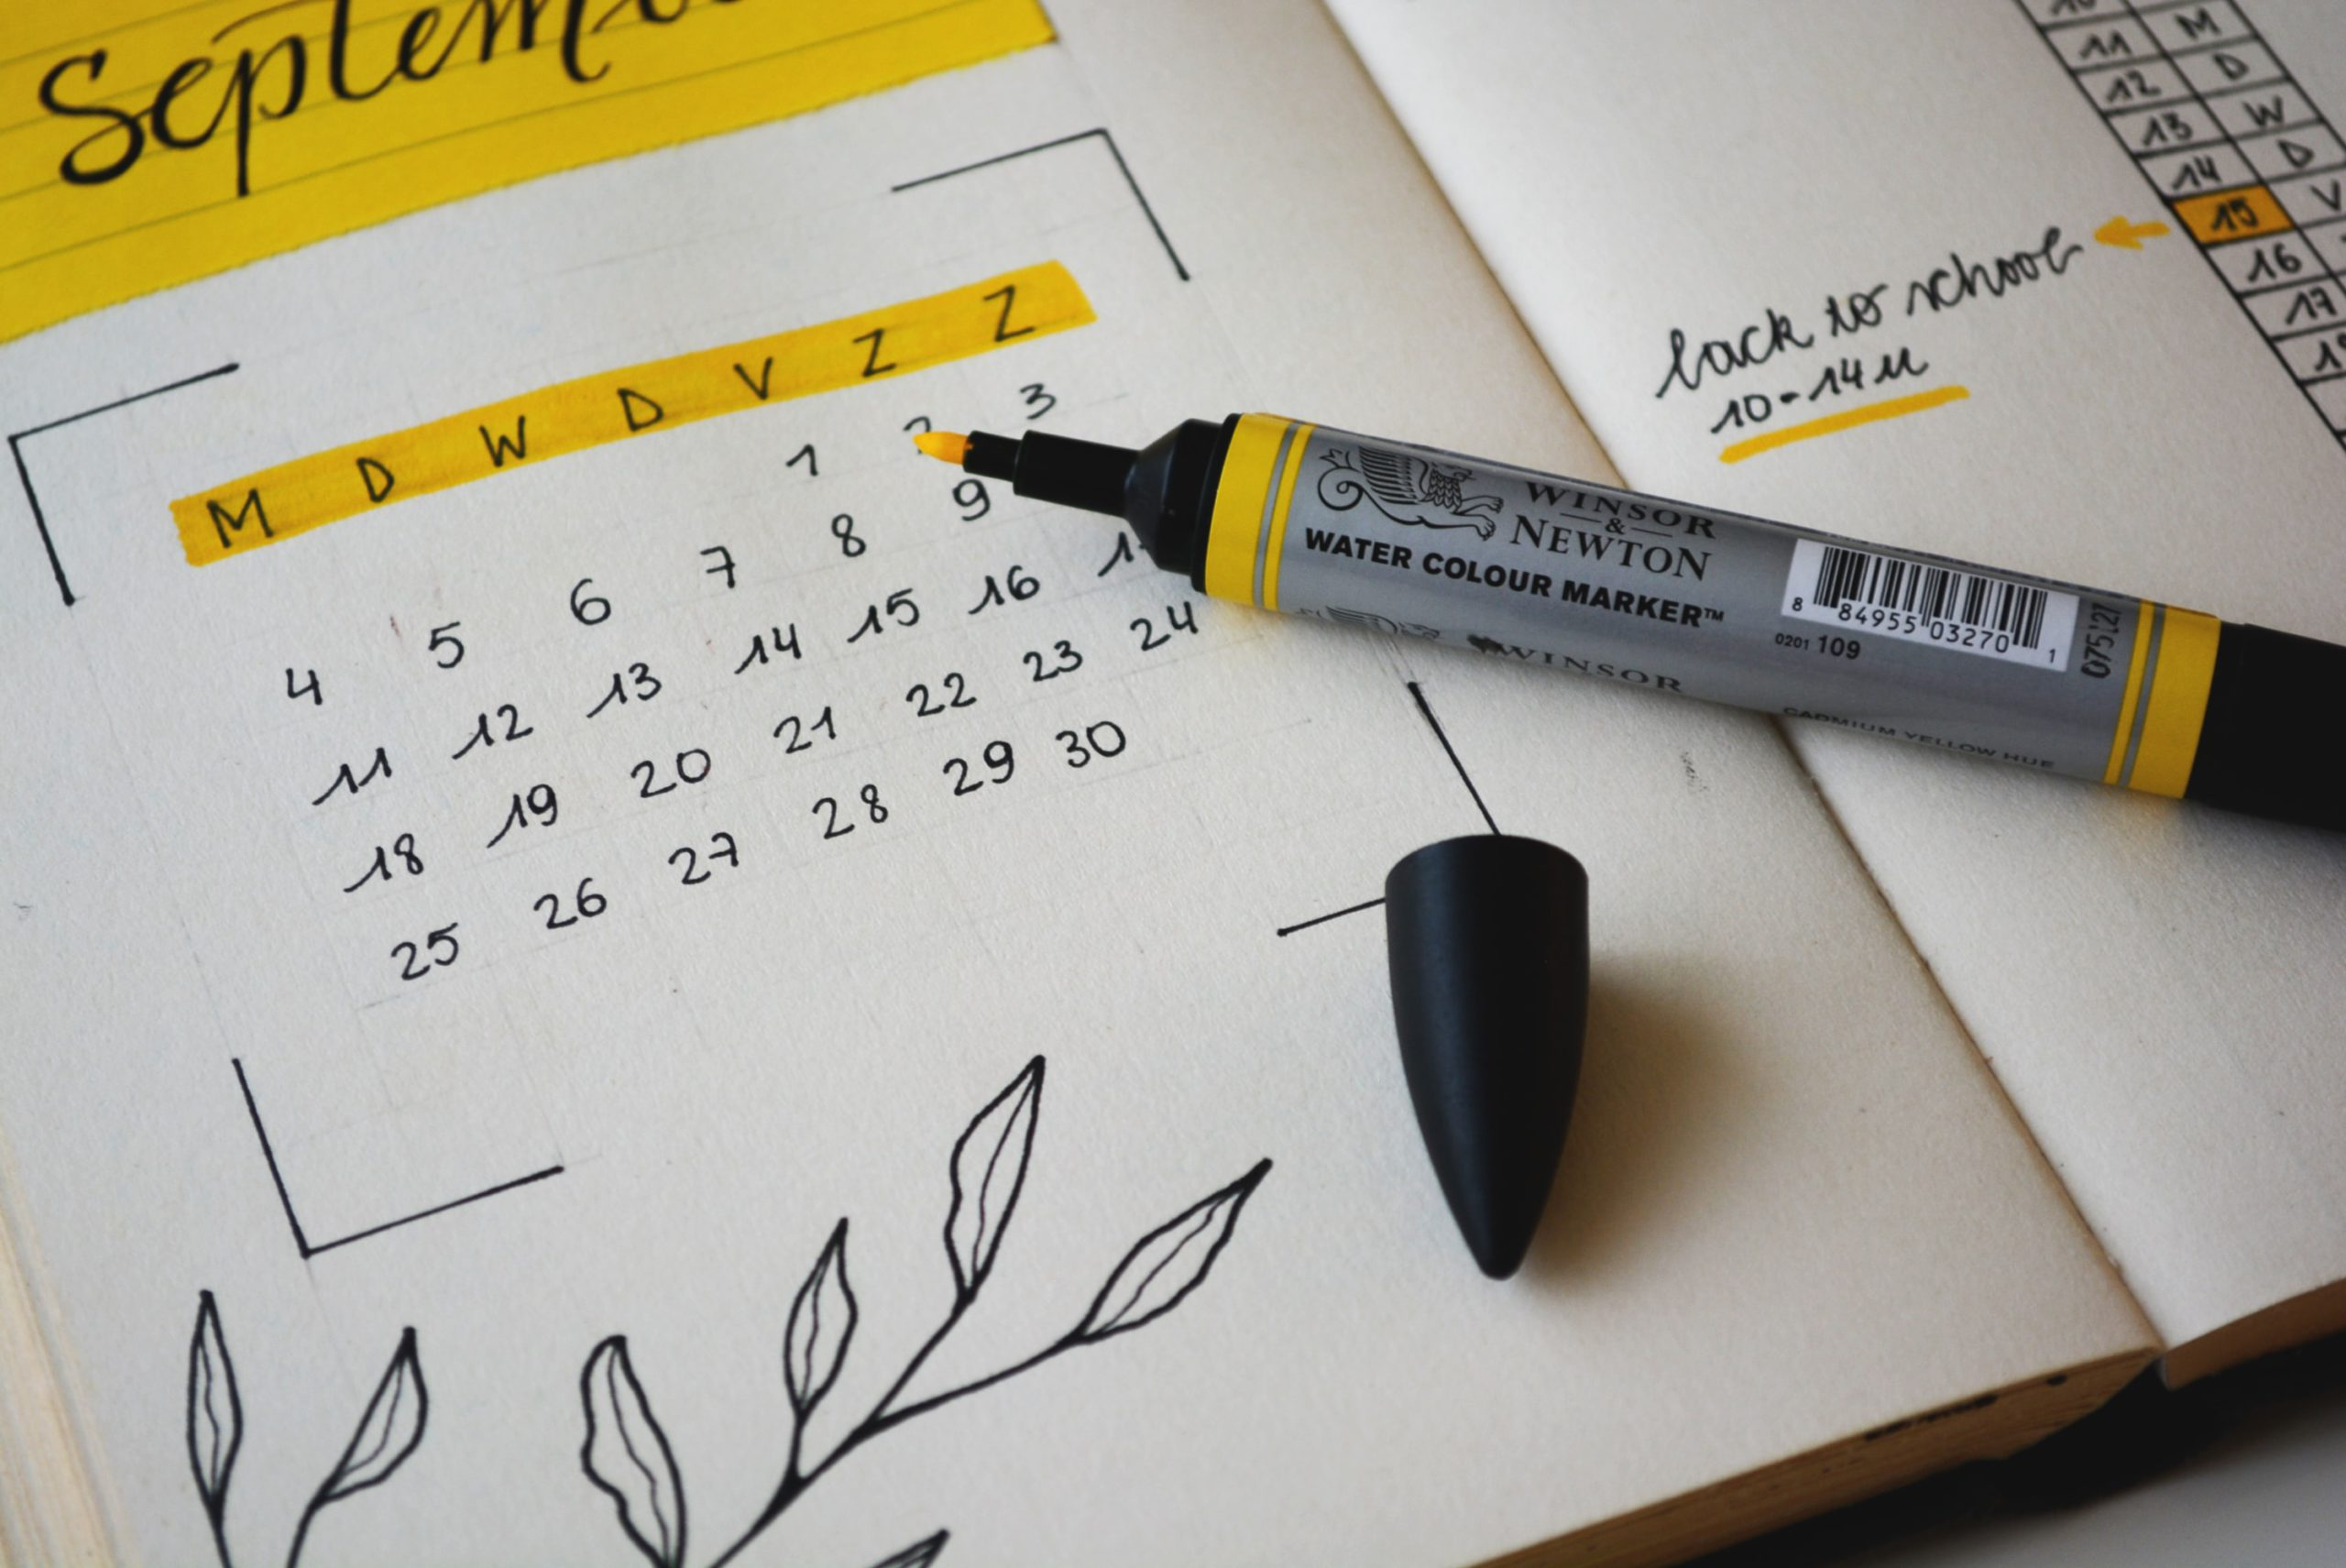 Cursusplanning januari-maart 2021 bekend!